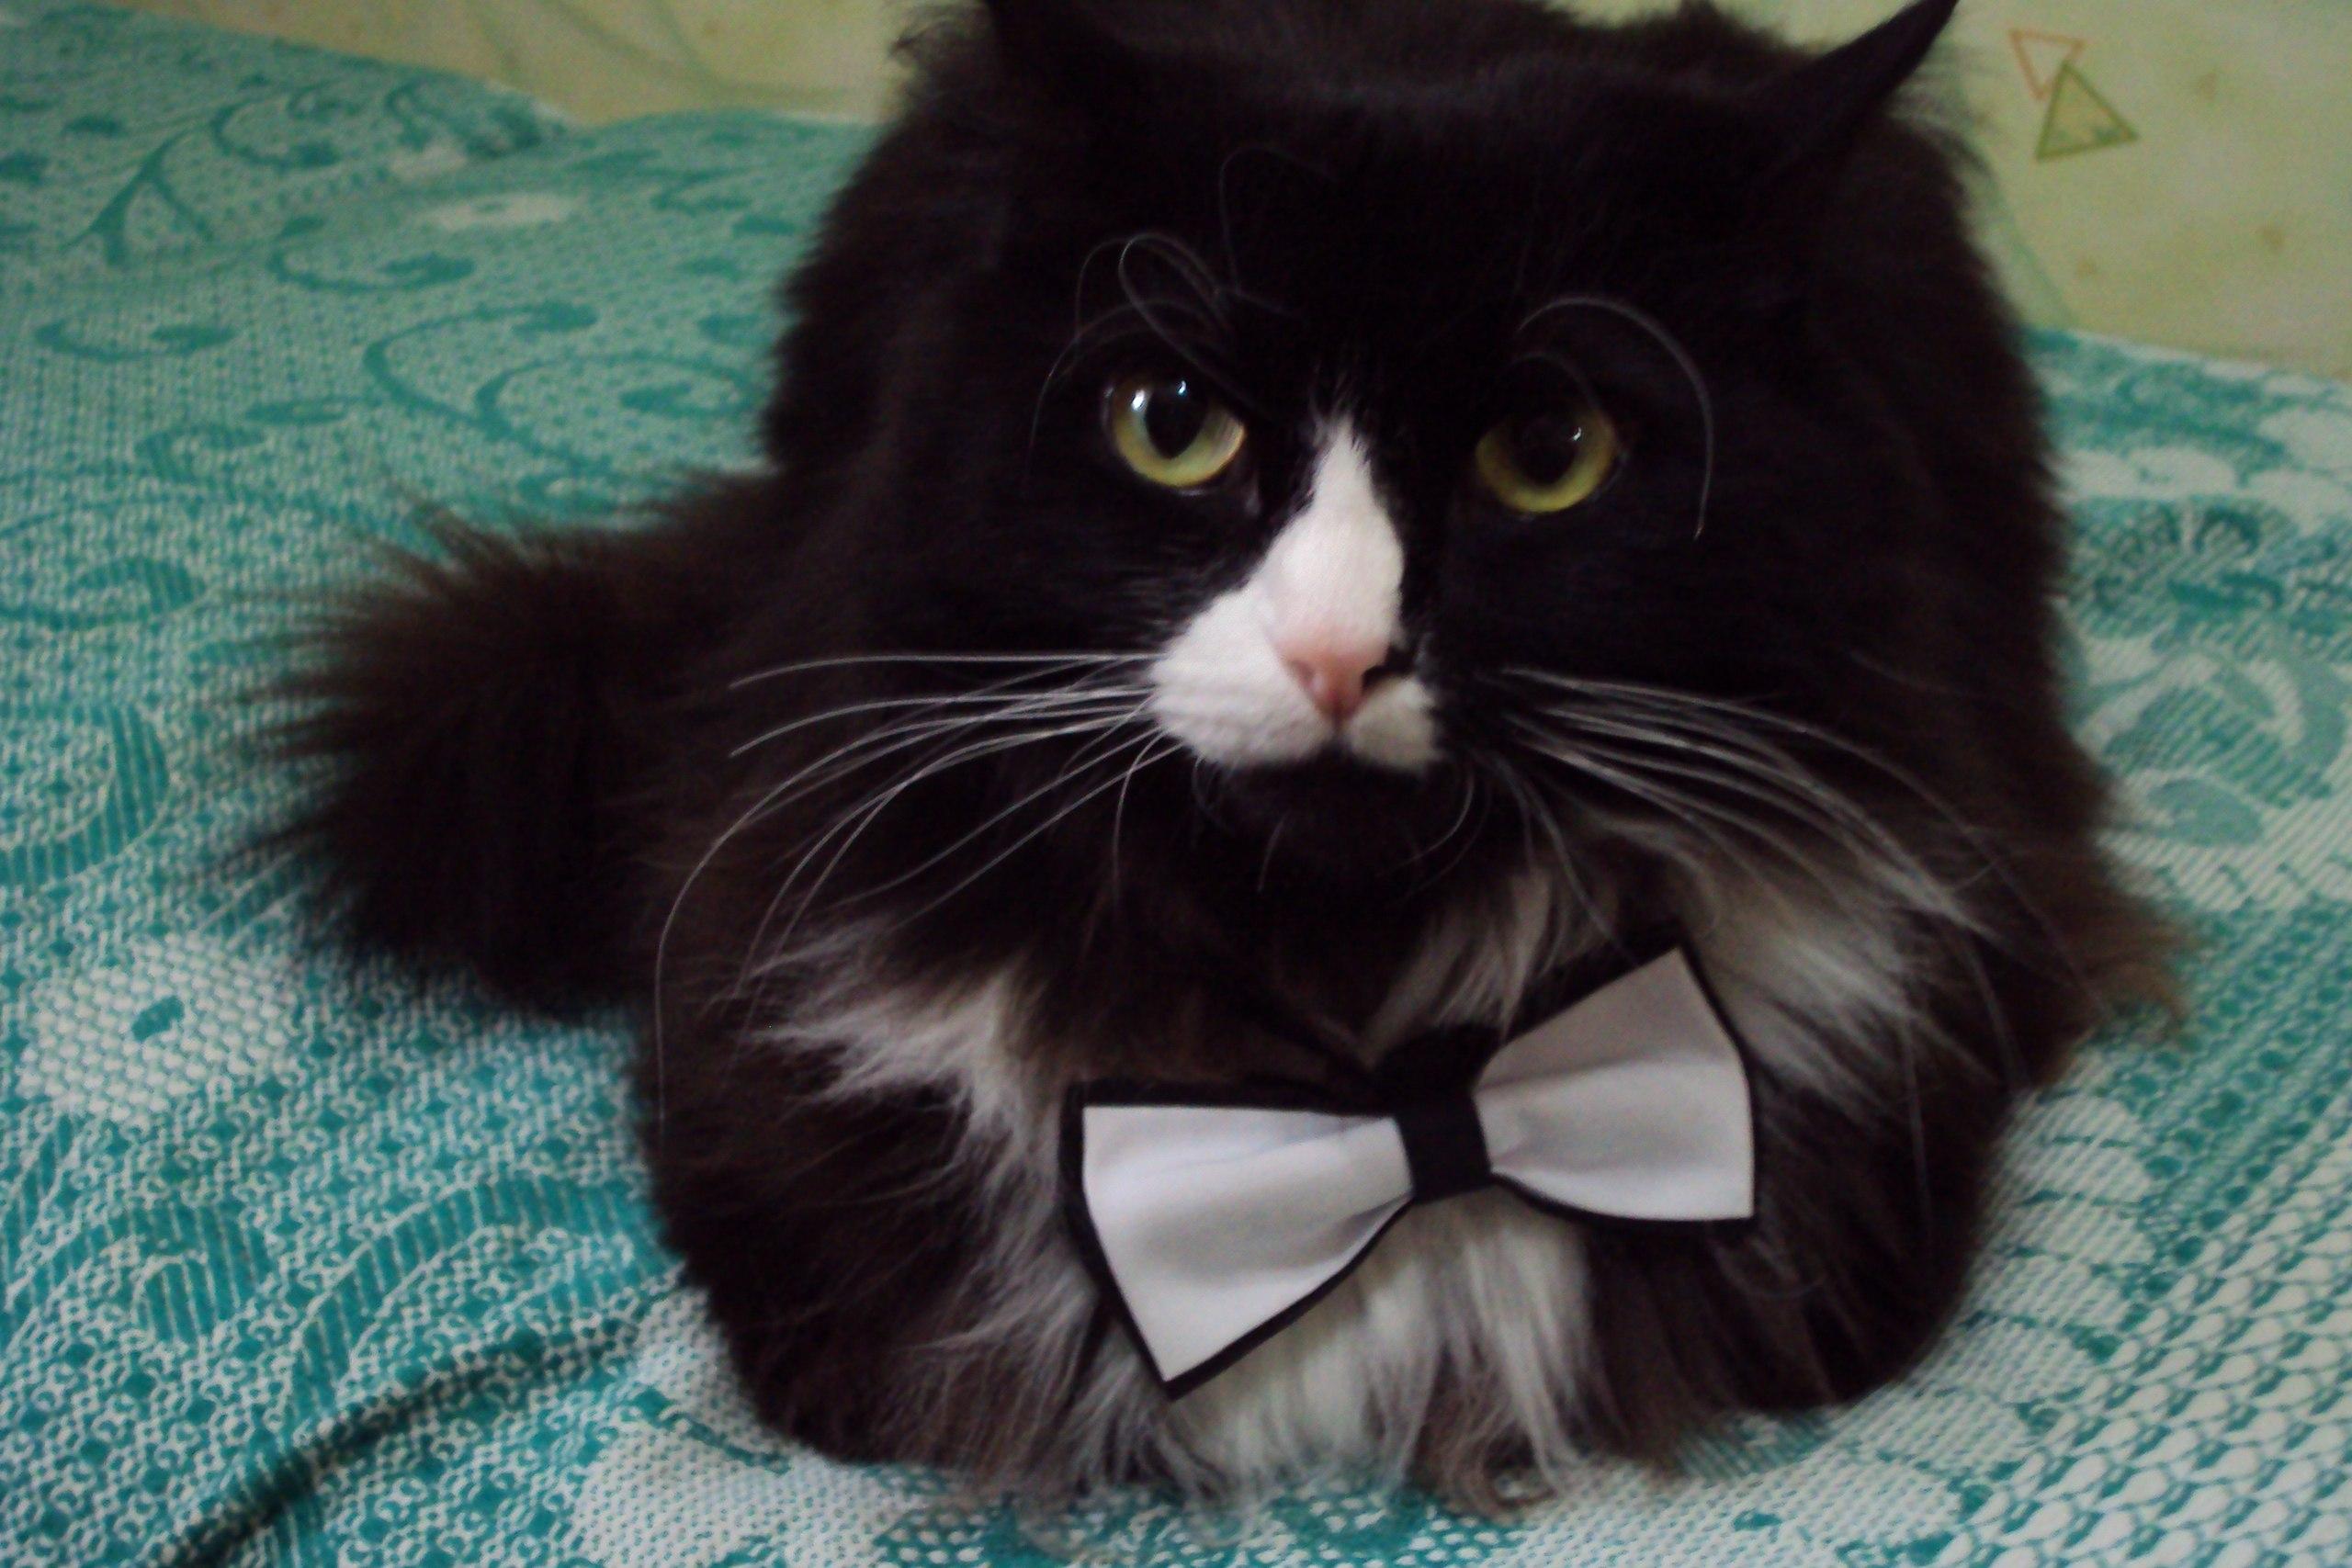 Позвольте представиться-Томас!СЭР -ТОМАС!. Блиц: семейство кошачьих